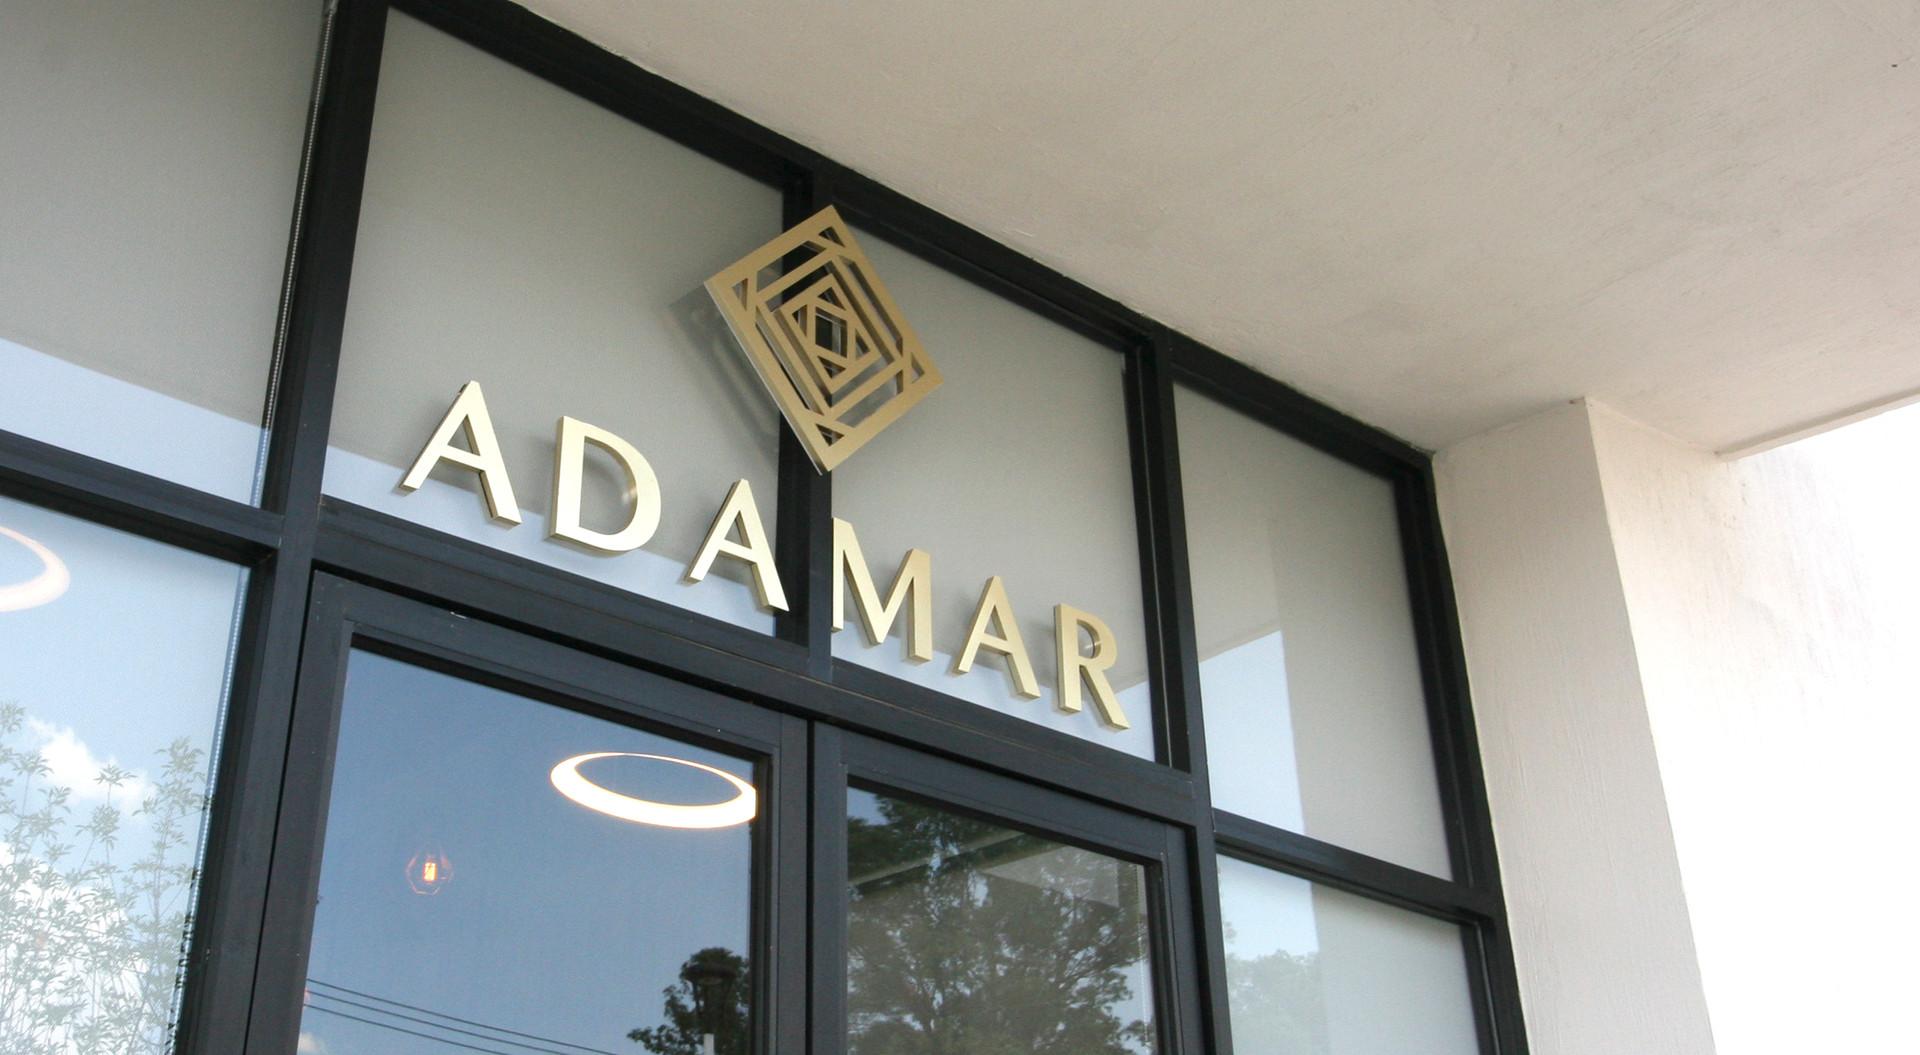 Adamar1.jpg